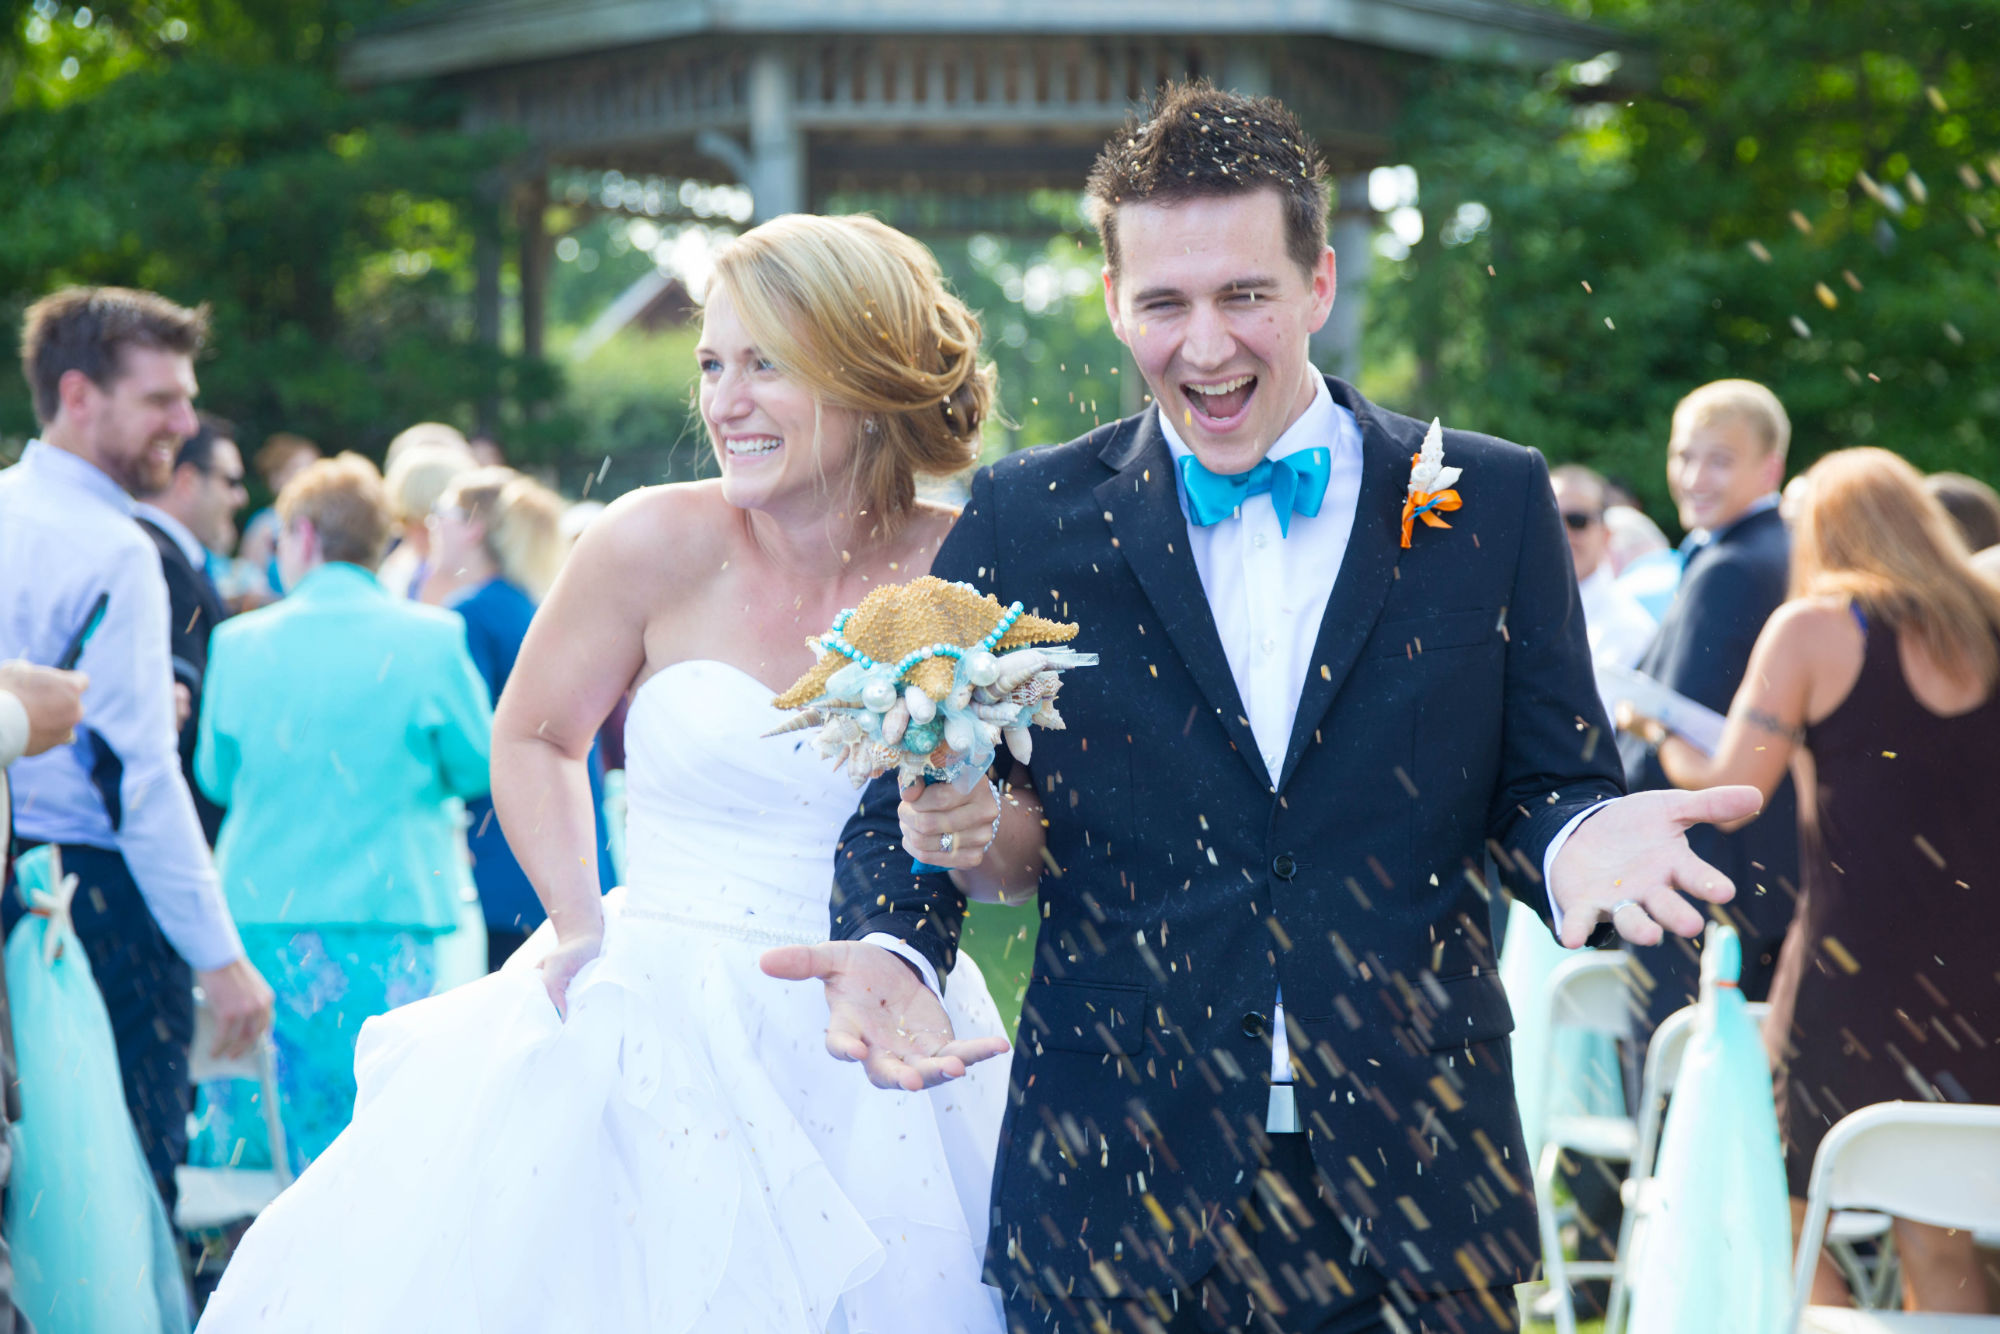 Joey and Ali Scuba Wedding Sprinkles